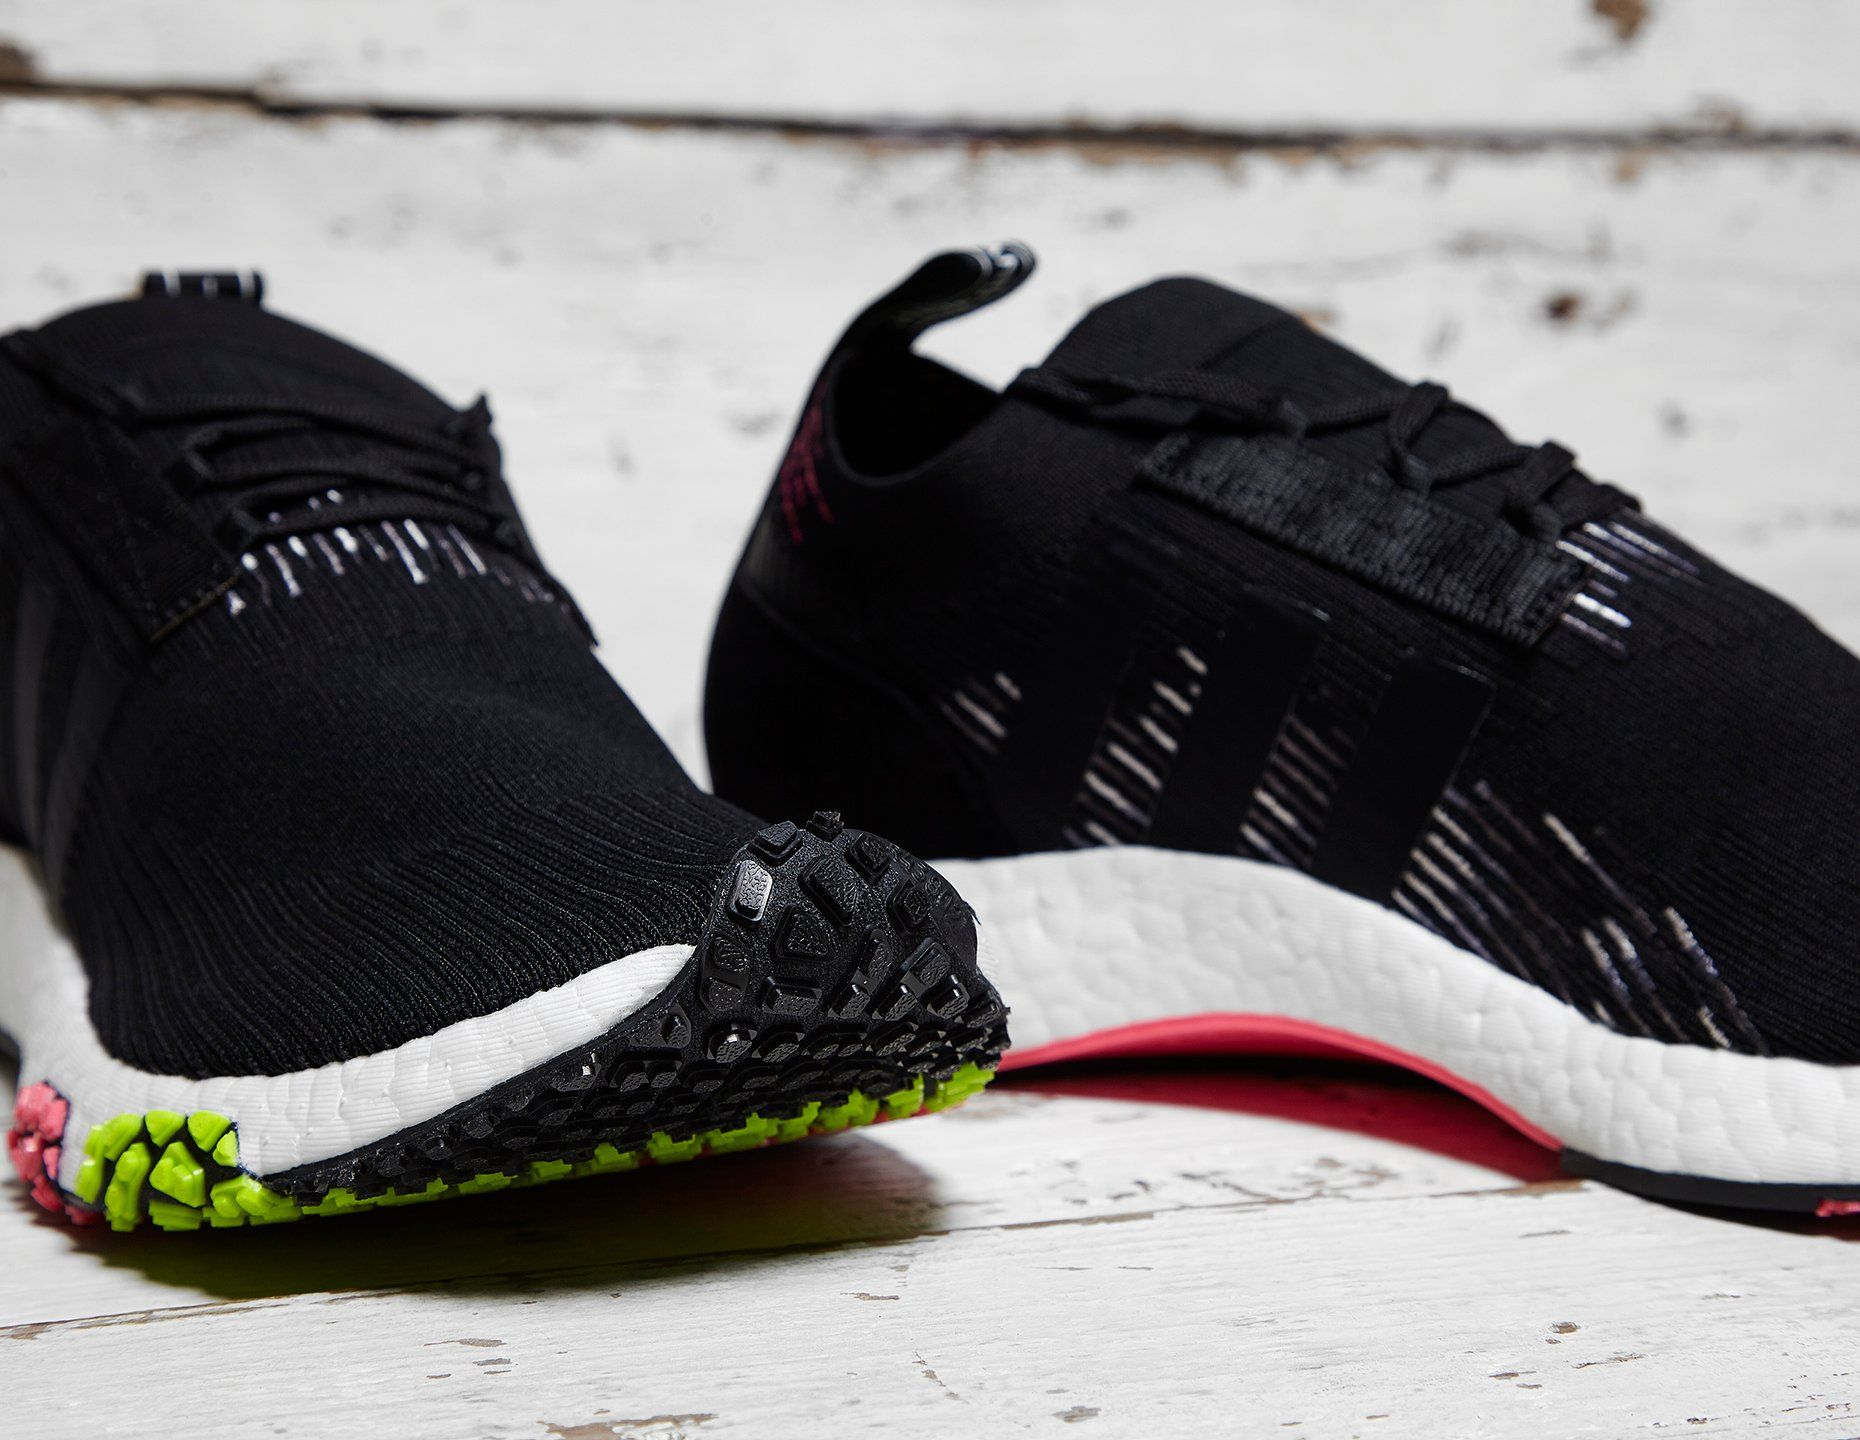 Adidas Originals Nmd Racer Primeknit Footpatrol